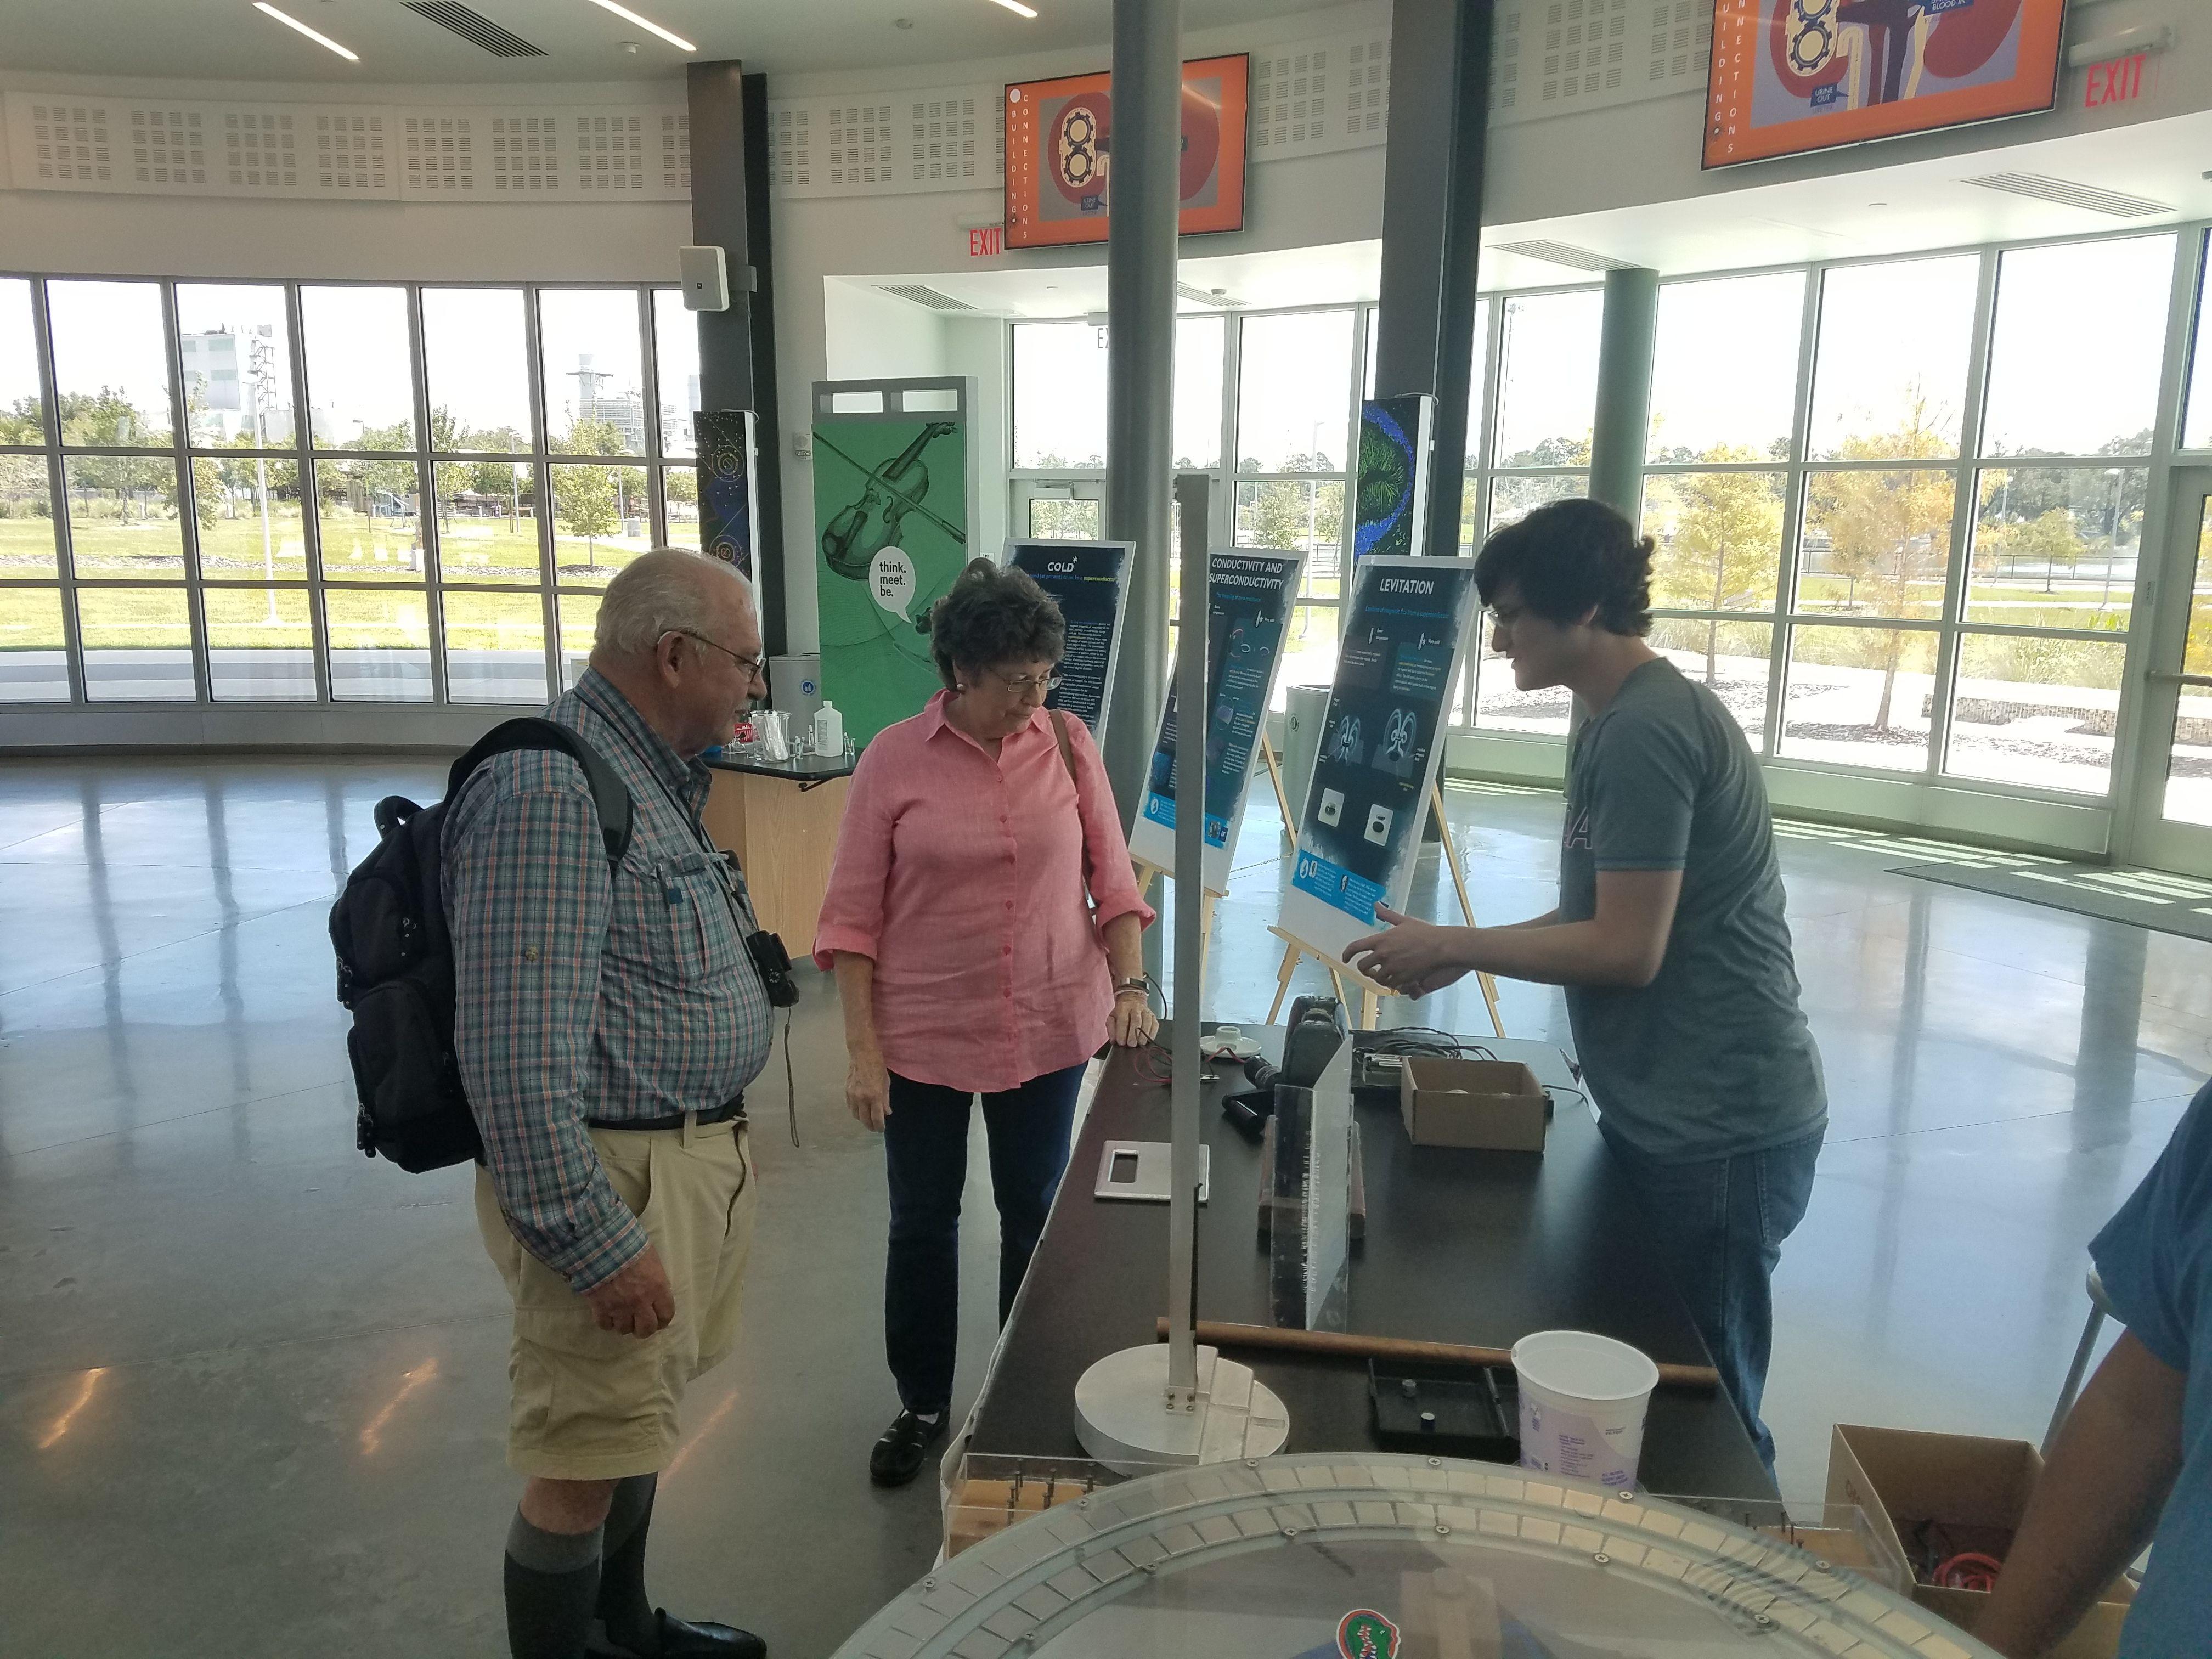 Cade Museum demonstration on Superconductivity